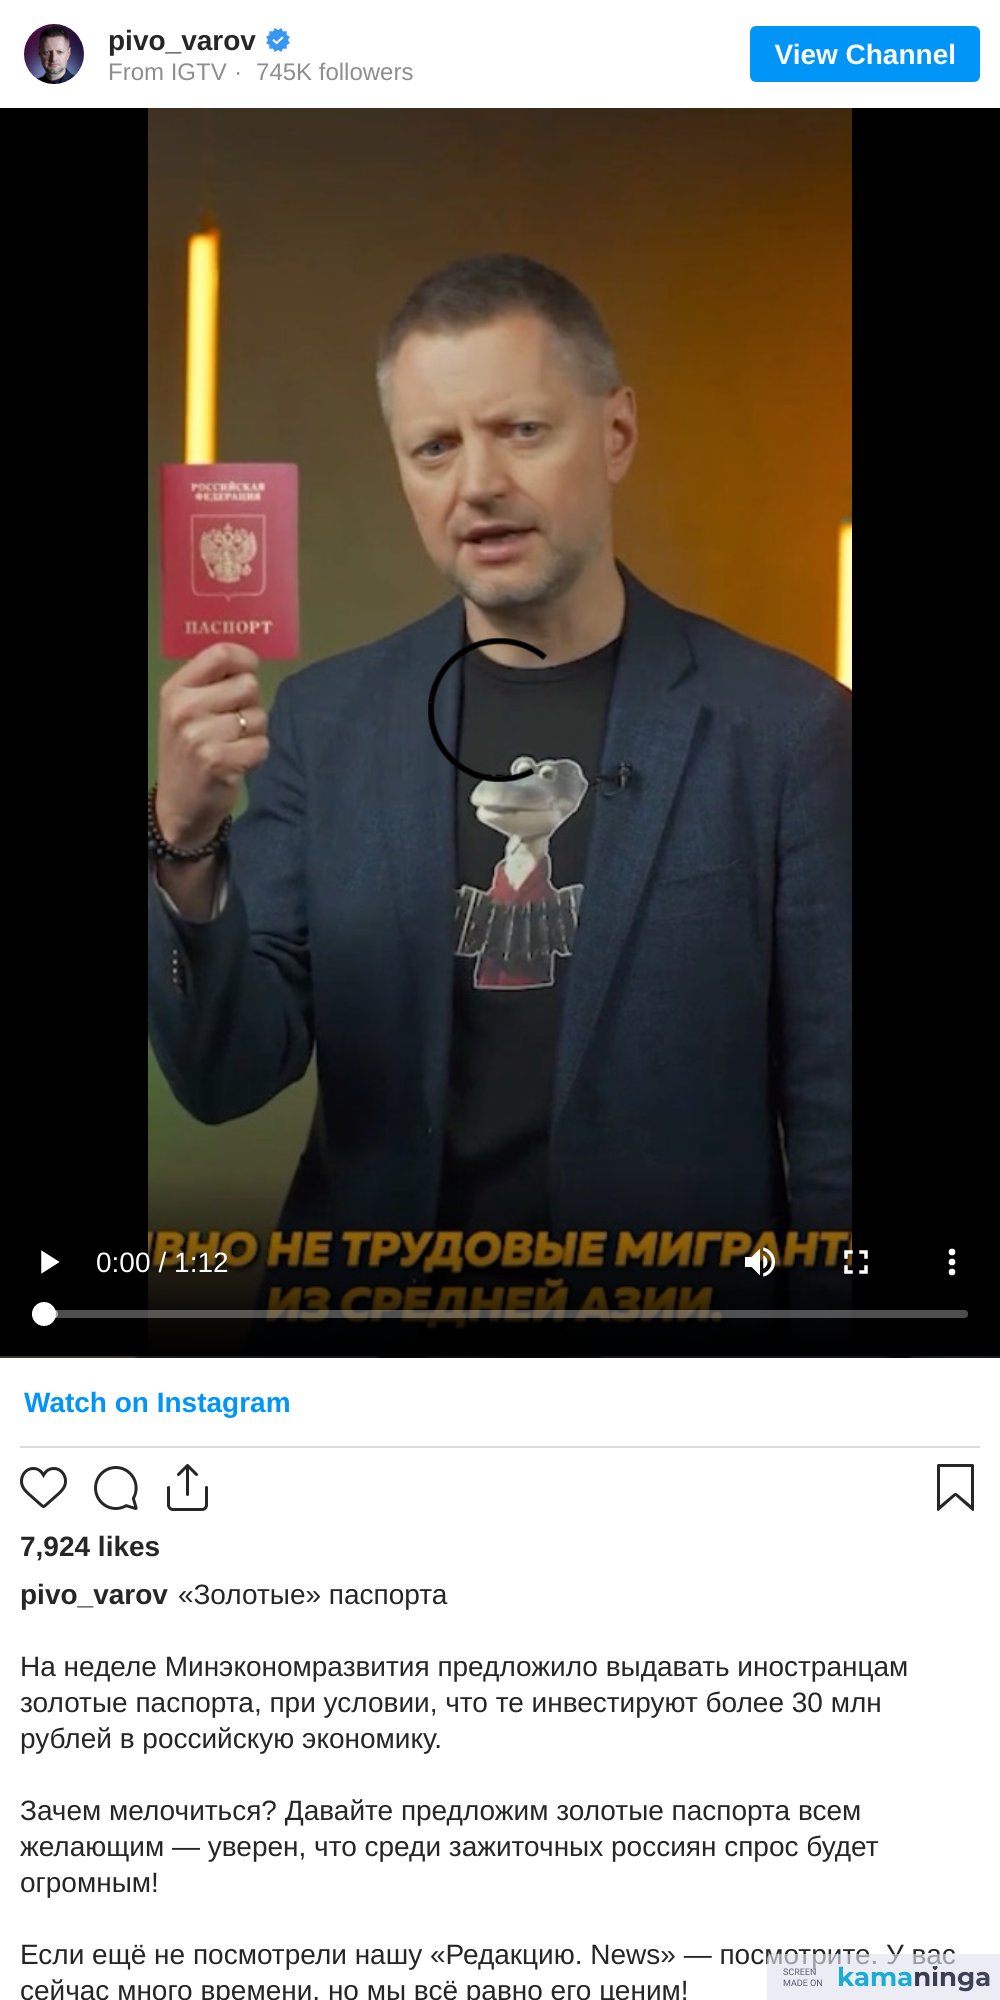 https://www.instagram.com/tv/COZ-17rHwnO/